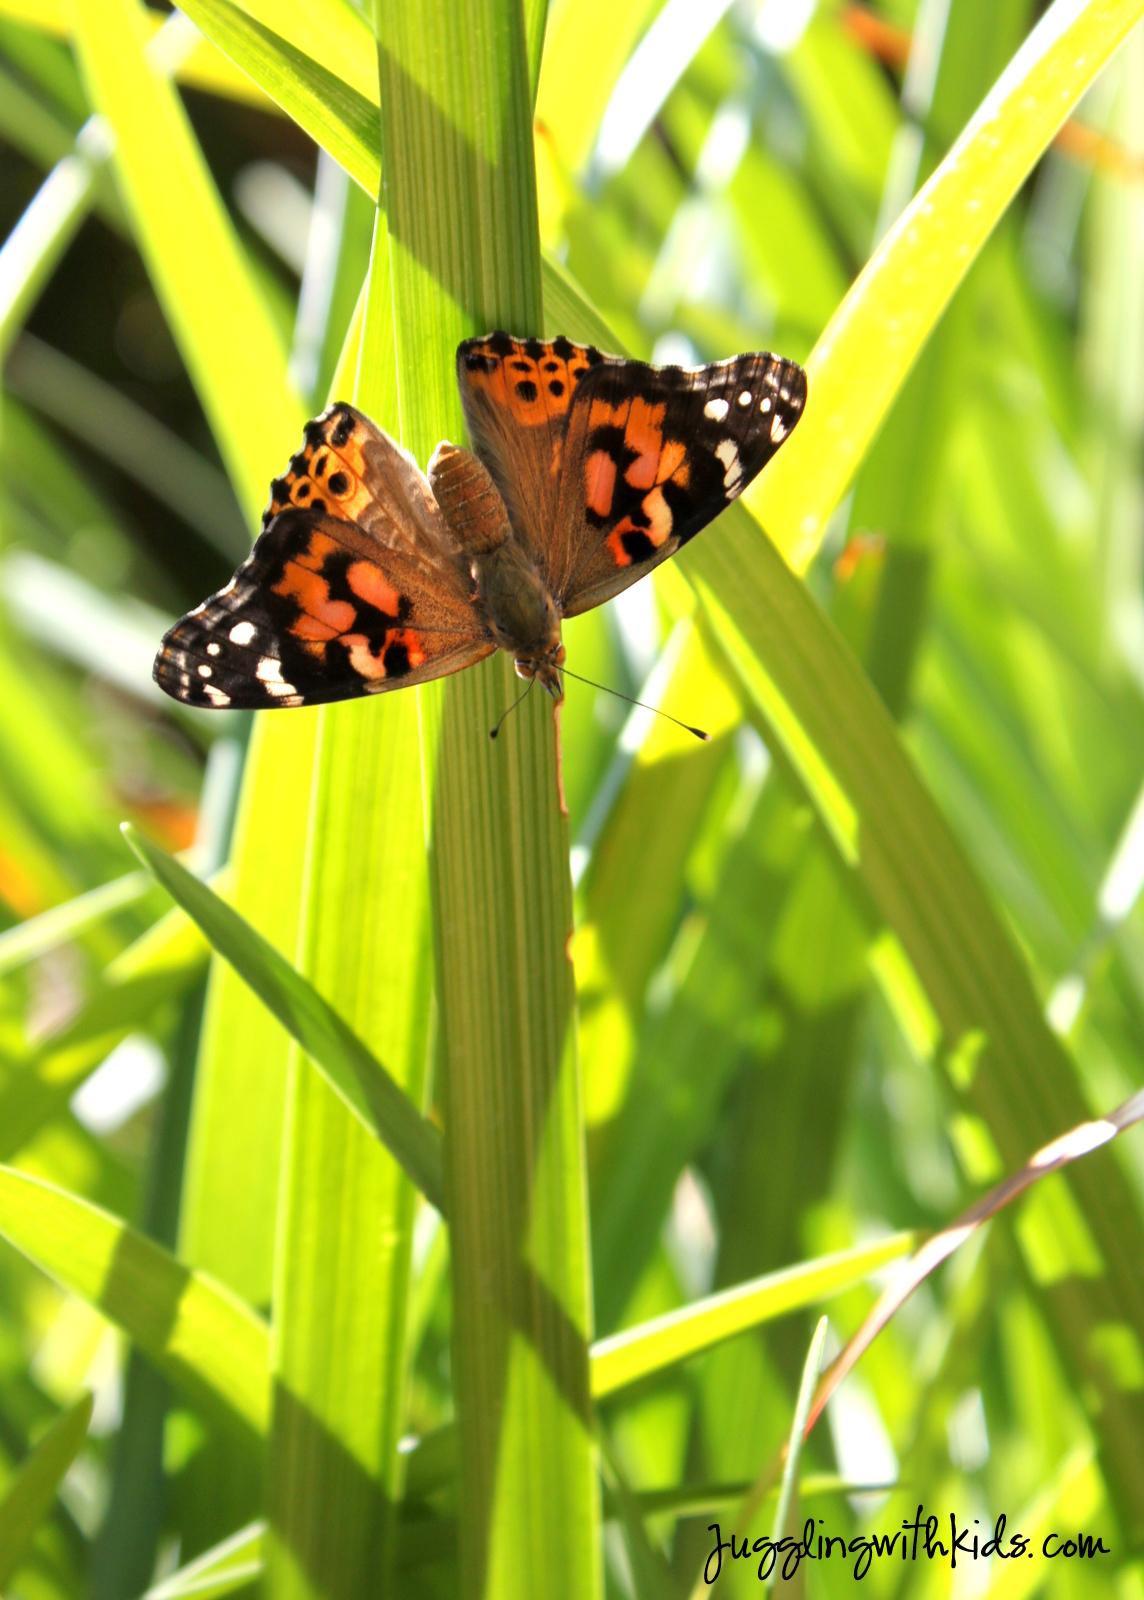 Caterpillars Chrysalis And Butterflies Oh My Juggling